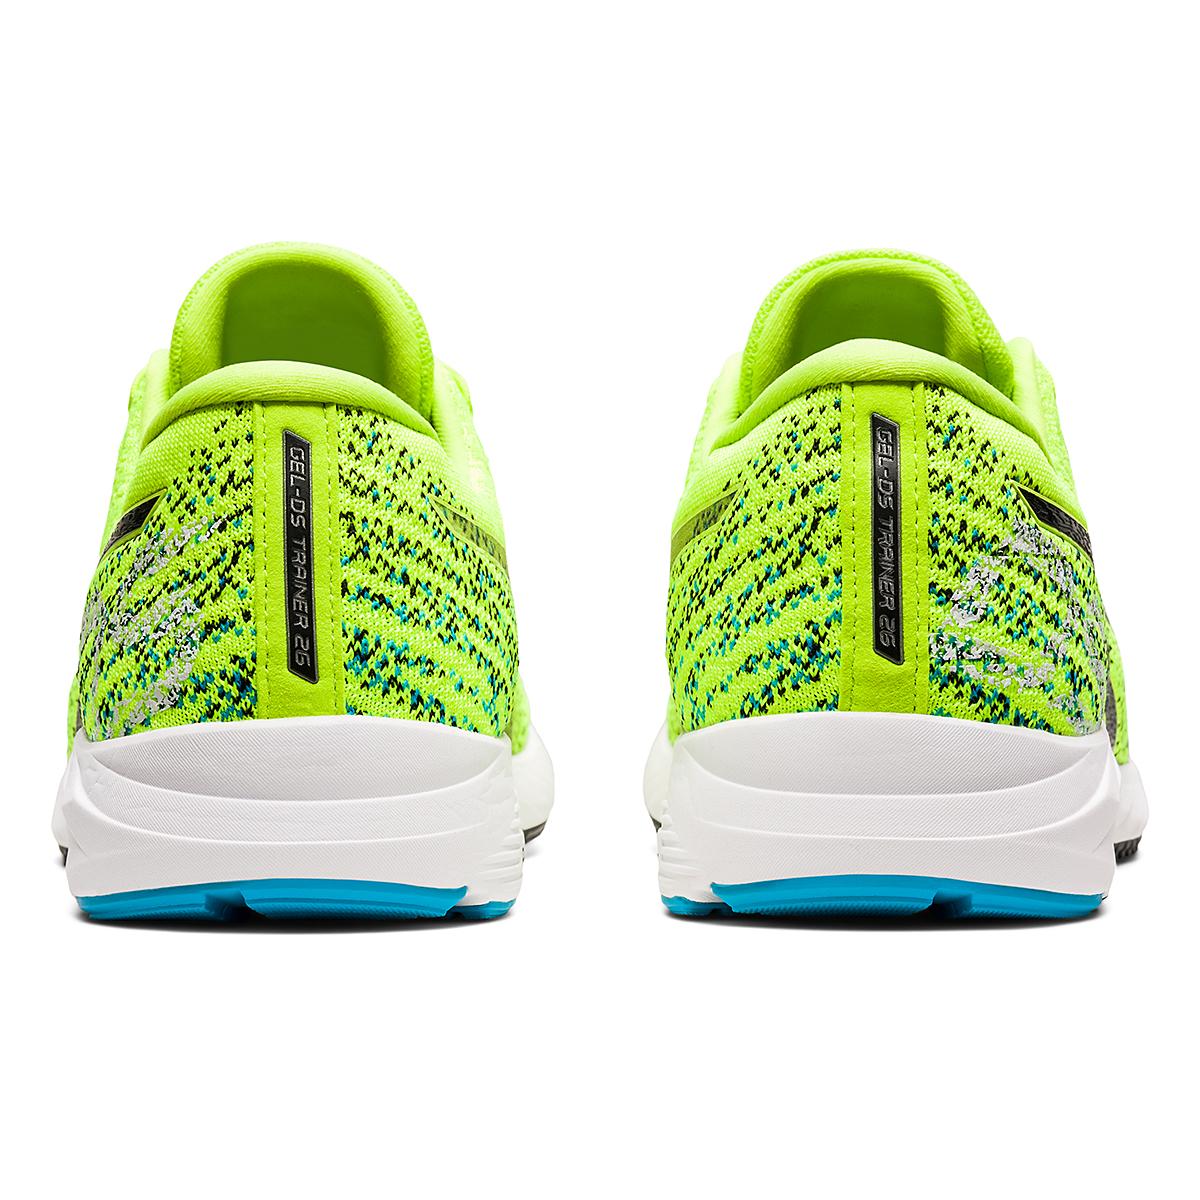 Men's Asics Gel-DS Trainer 26 Running Shoe - Color: Hazard Green/Black - Size: 6 - Width: Regular, Hazard Green/Black, large, image 5